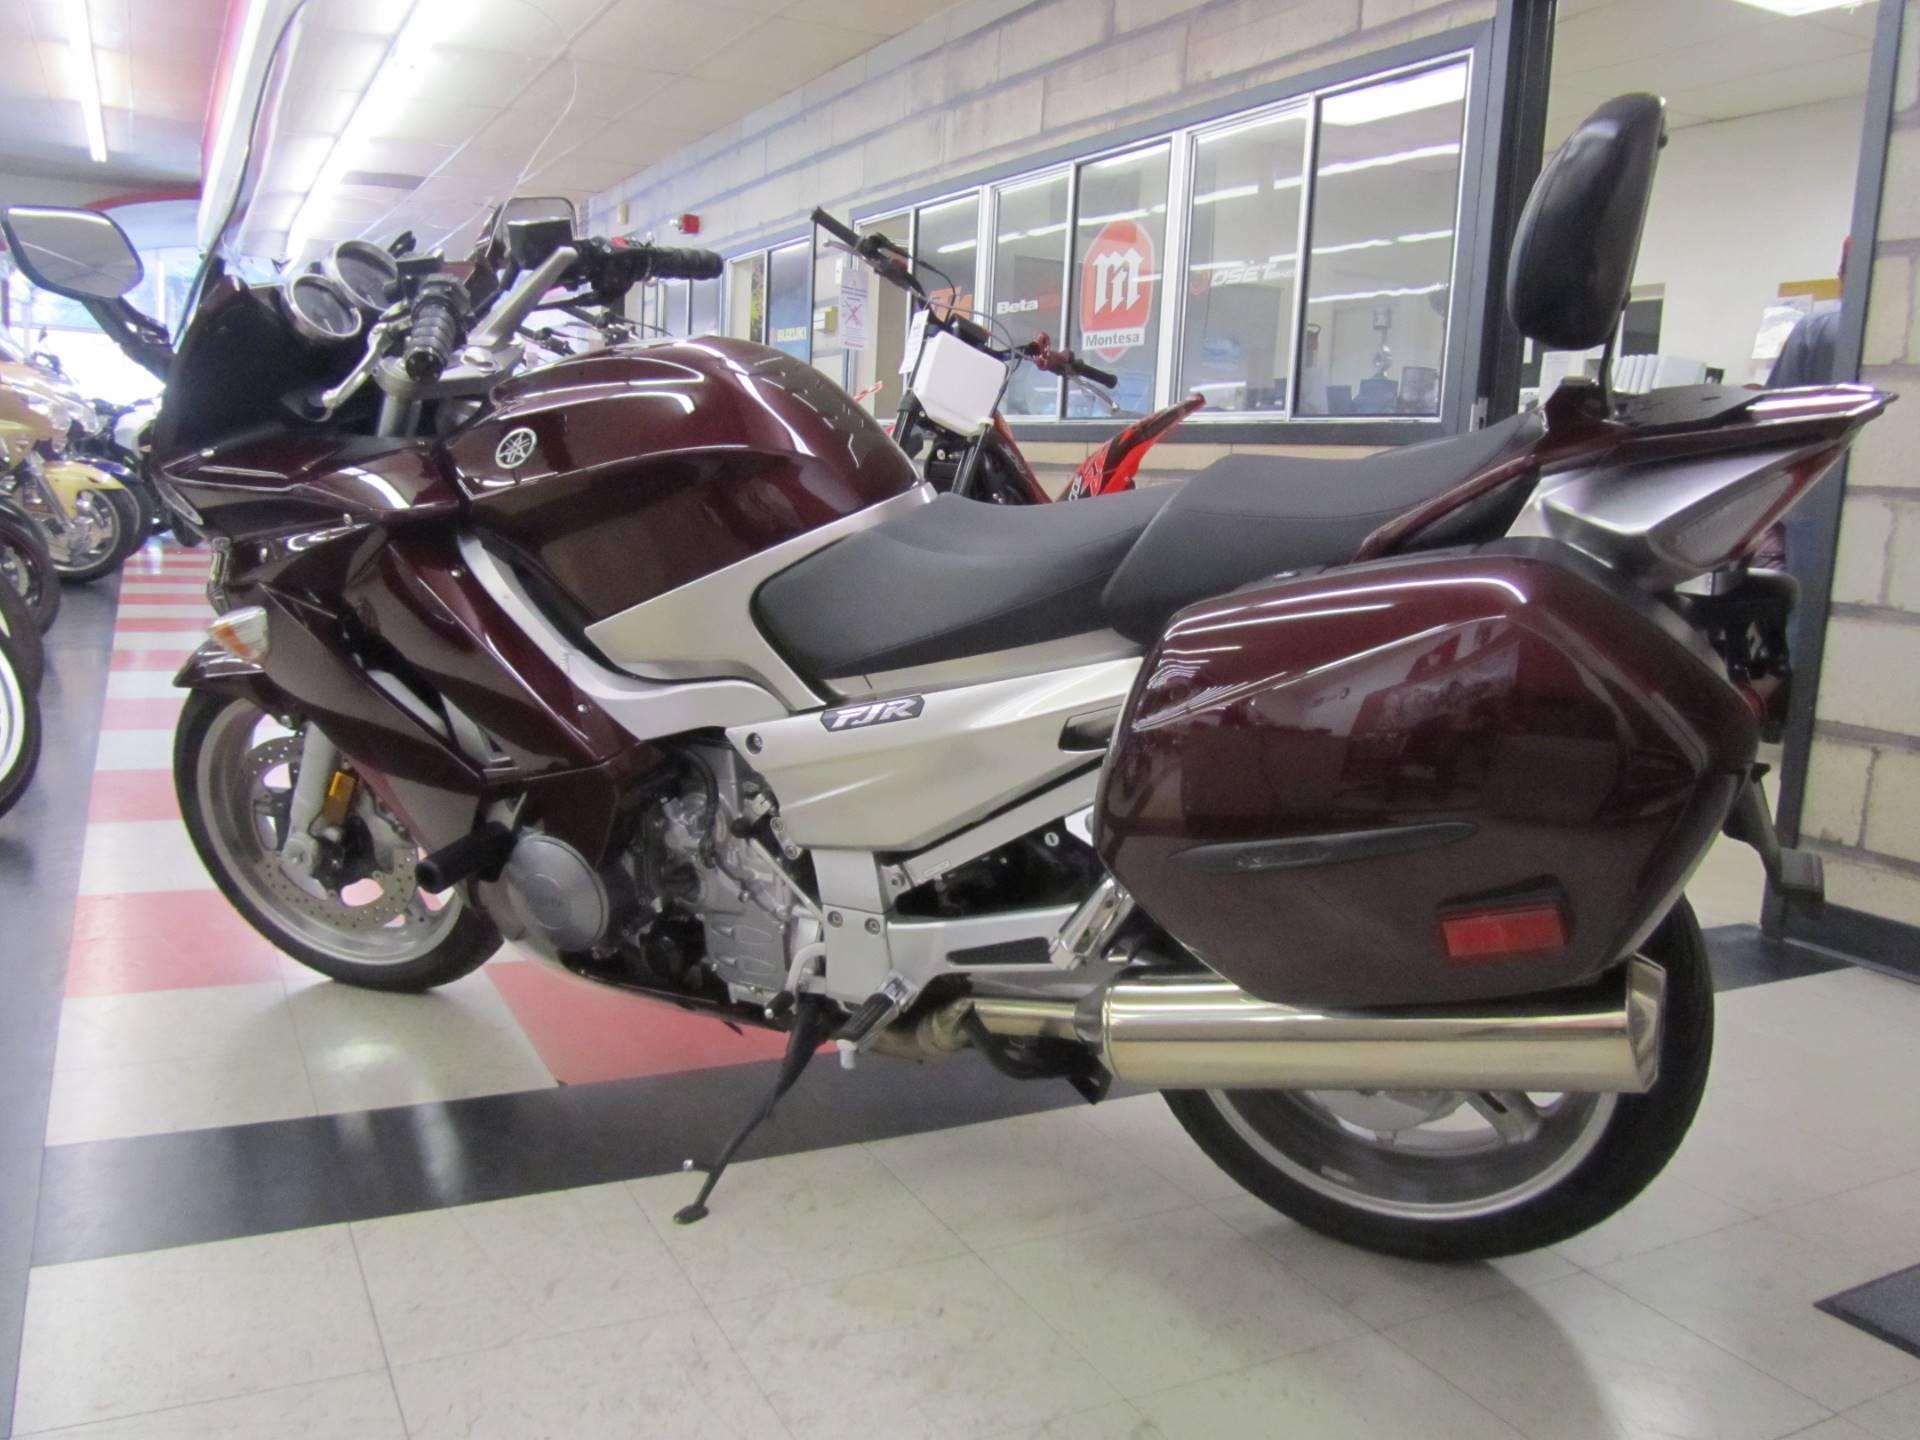 2007 Yamaha FJR 1300A 1